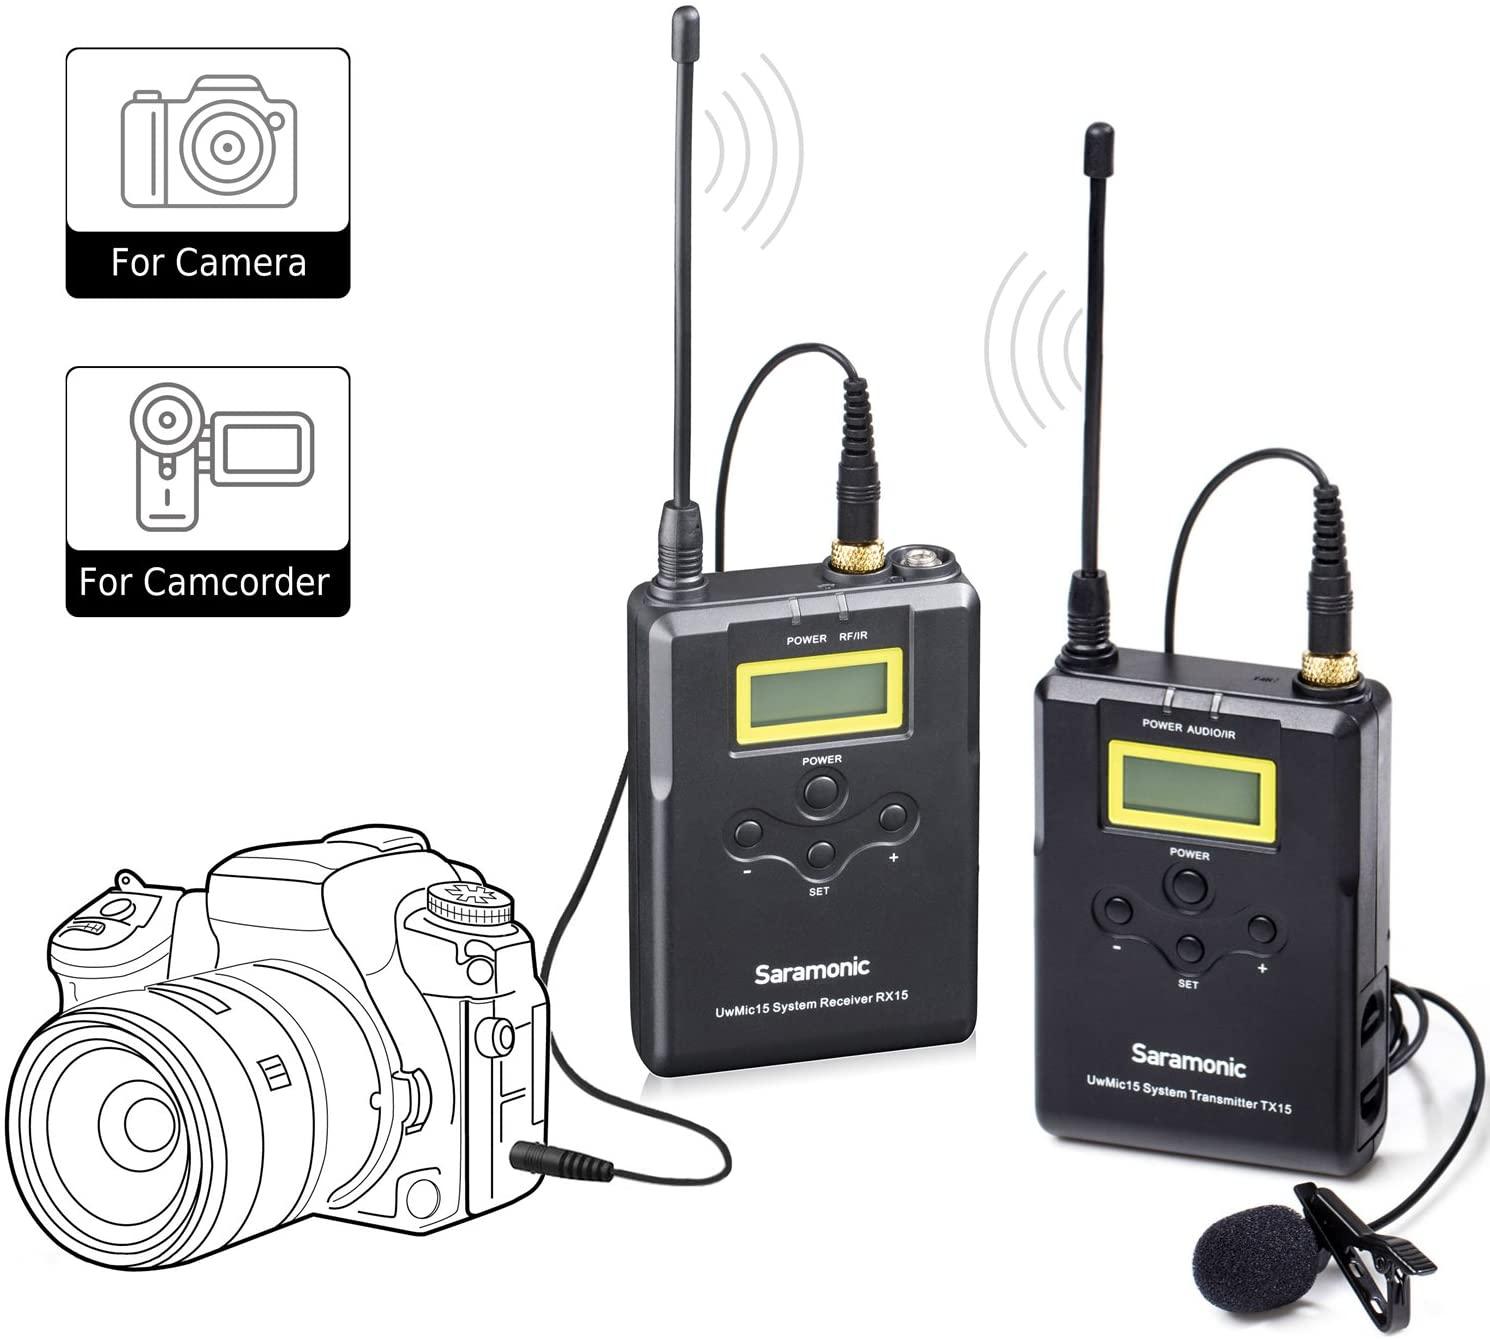 Wireless Lavalier Microphone System, Saramonic UwMic15 UHF 16 Channel Omnidirectional Lap Mic for DSLR Camra,Camcorder Canon 5D II/5D III, Canon 6D, Panasonic GH5/GH4, Nikon,Panasonic